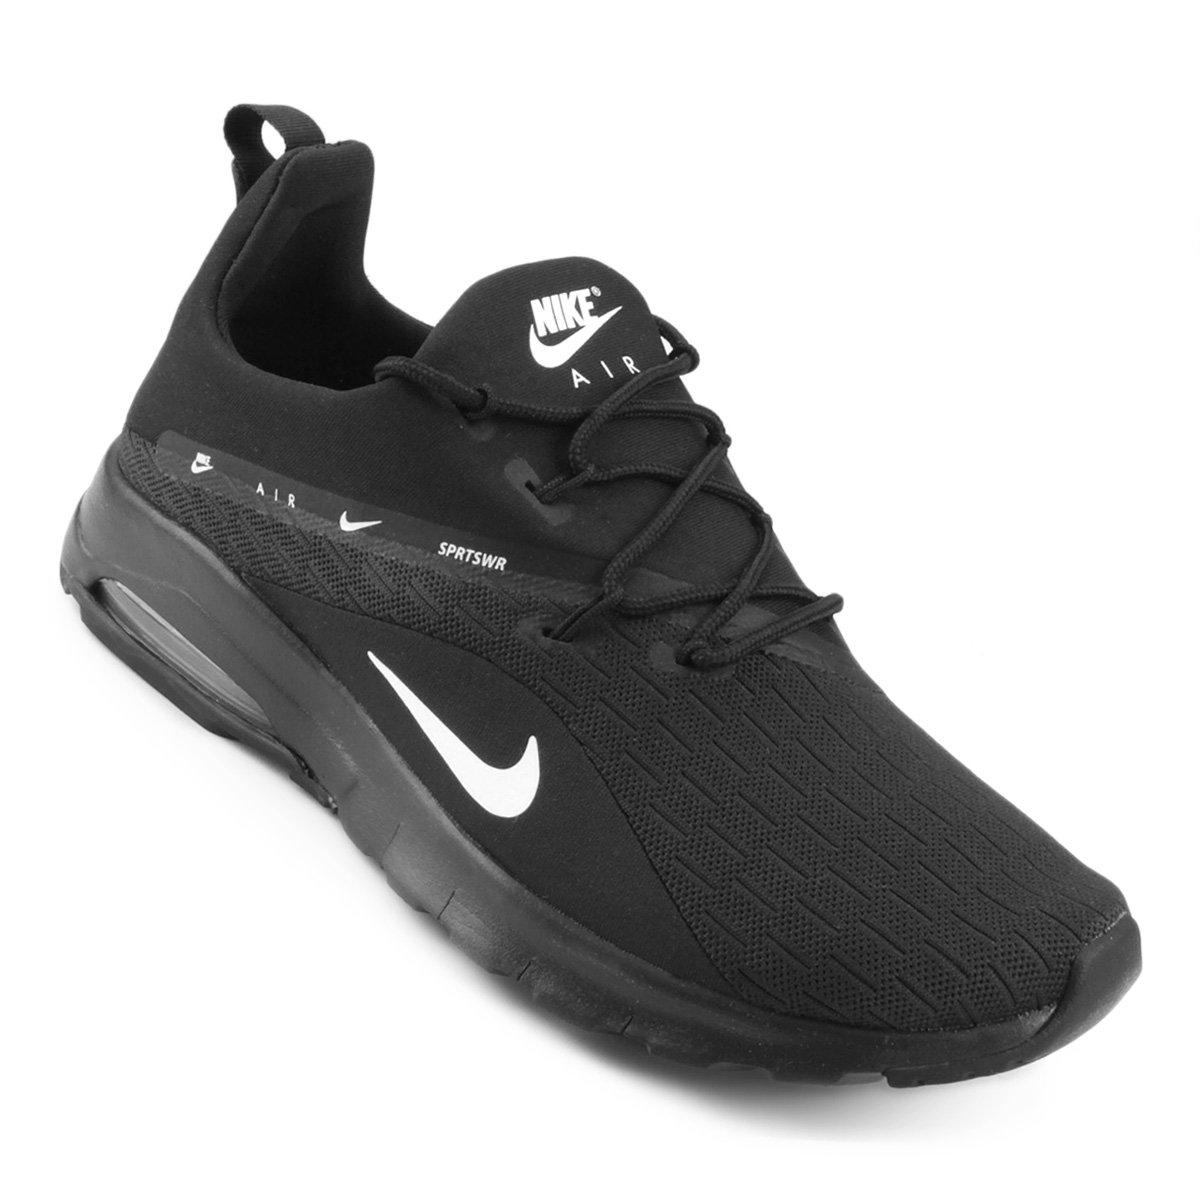 75938de5b654 ... black white men gap dis shoes shoes 18fa 3a360 3af59  best price tênis nike  air max motion racer 2 pretobranco c9430 97bd1